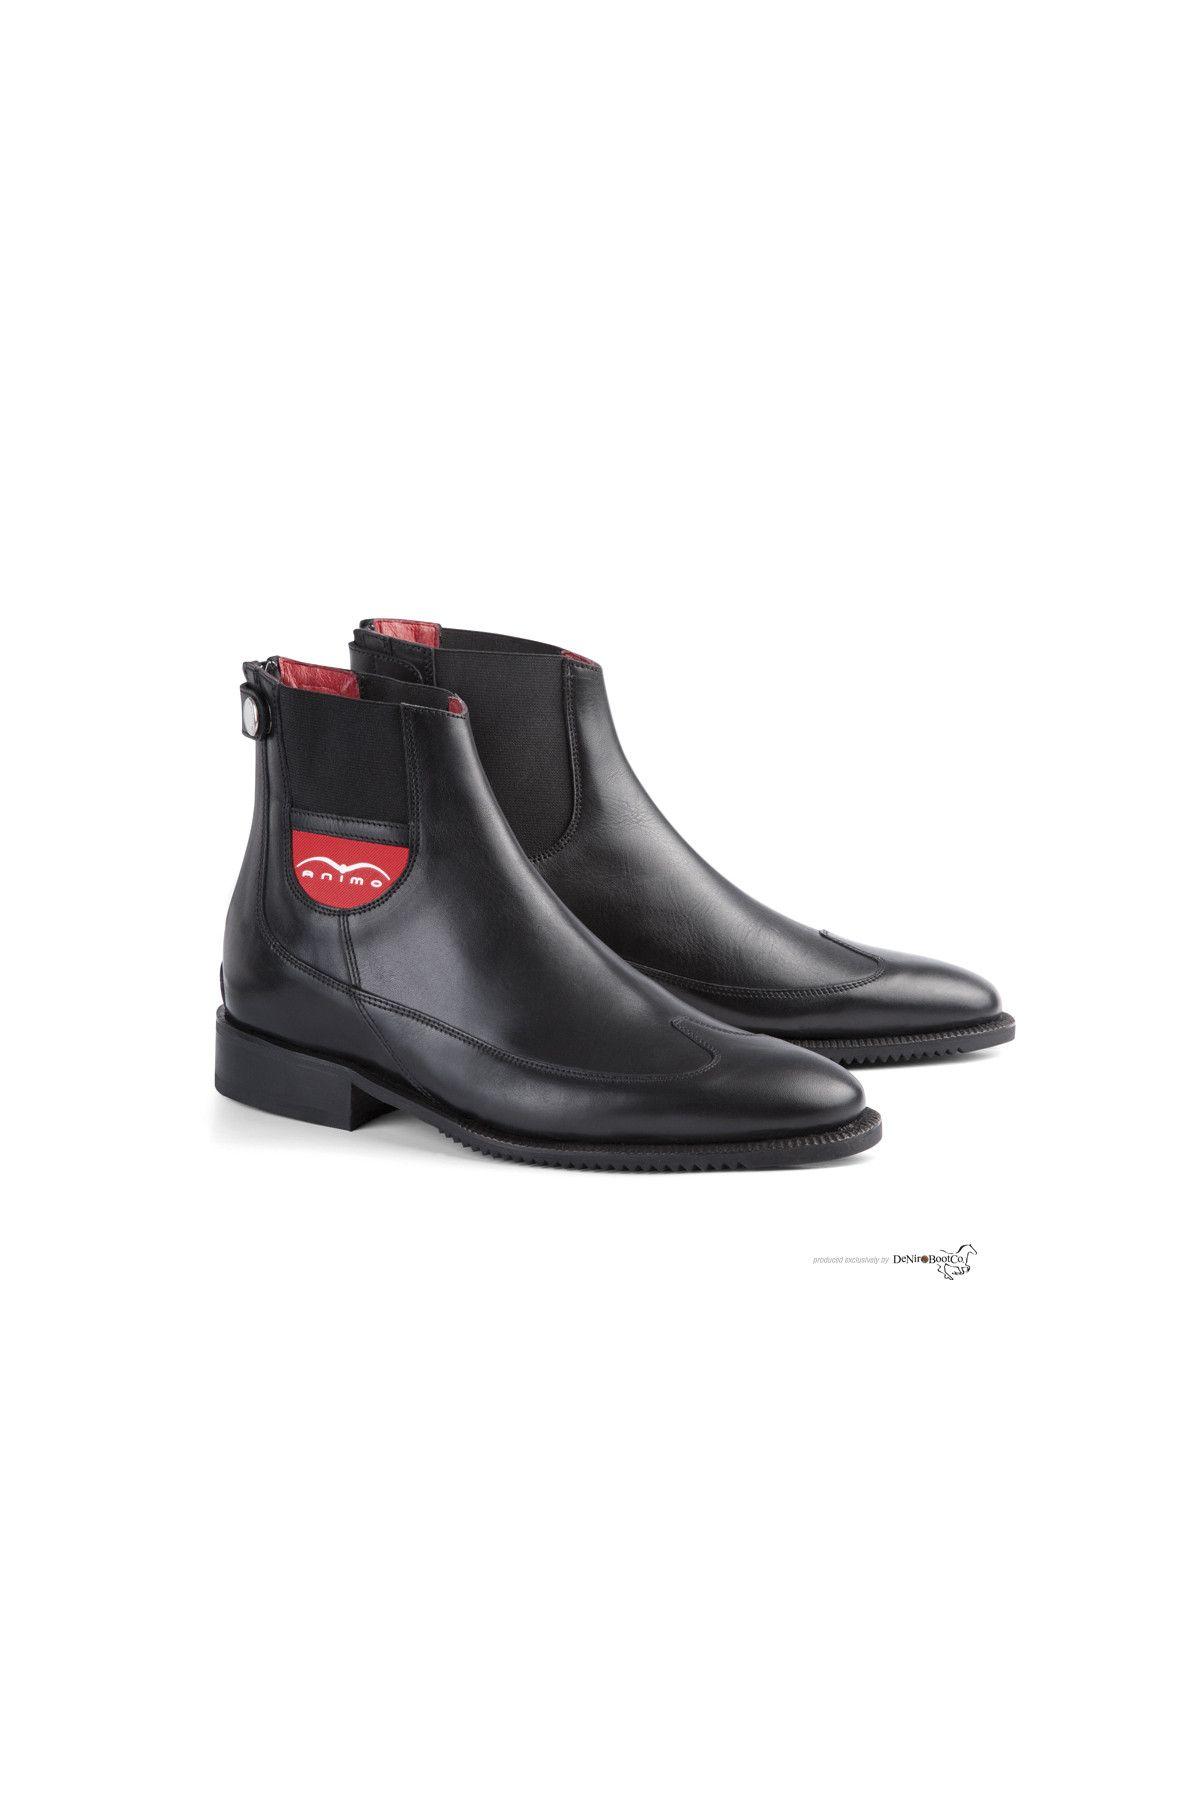 Animo Italia ZAMBIA Riding Boots - Professional Italian Ankle ...